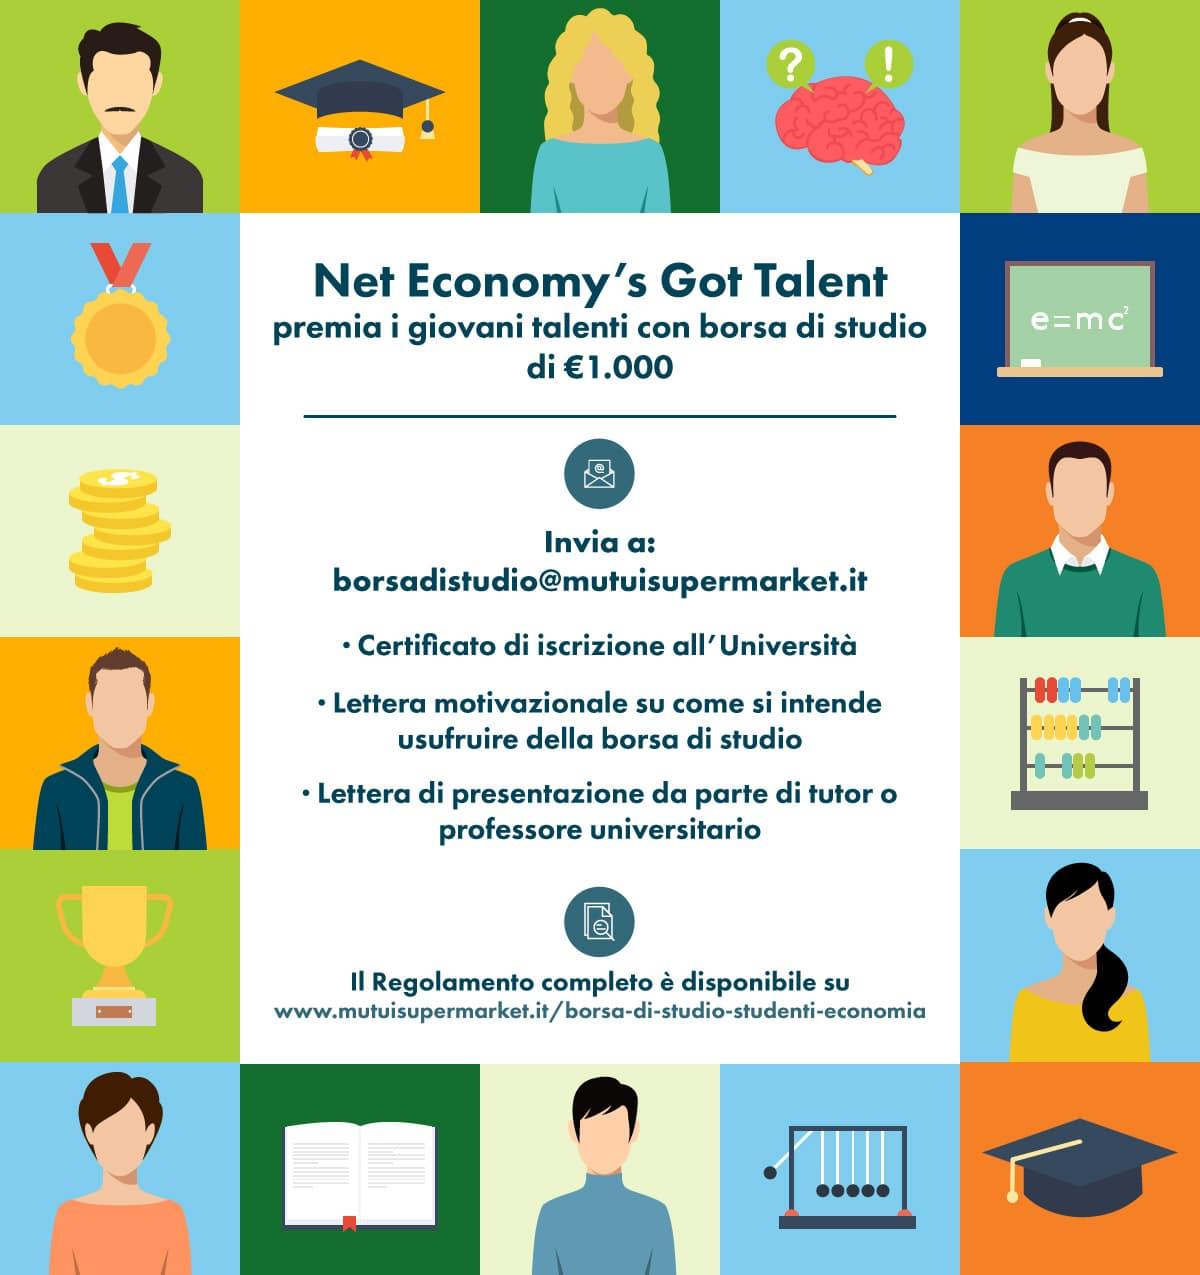 Net Economy's Got Talent: l'iniziativa che premia i giovani talenti 1